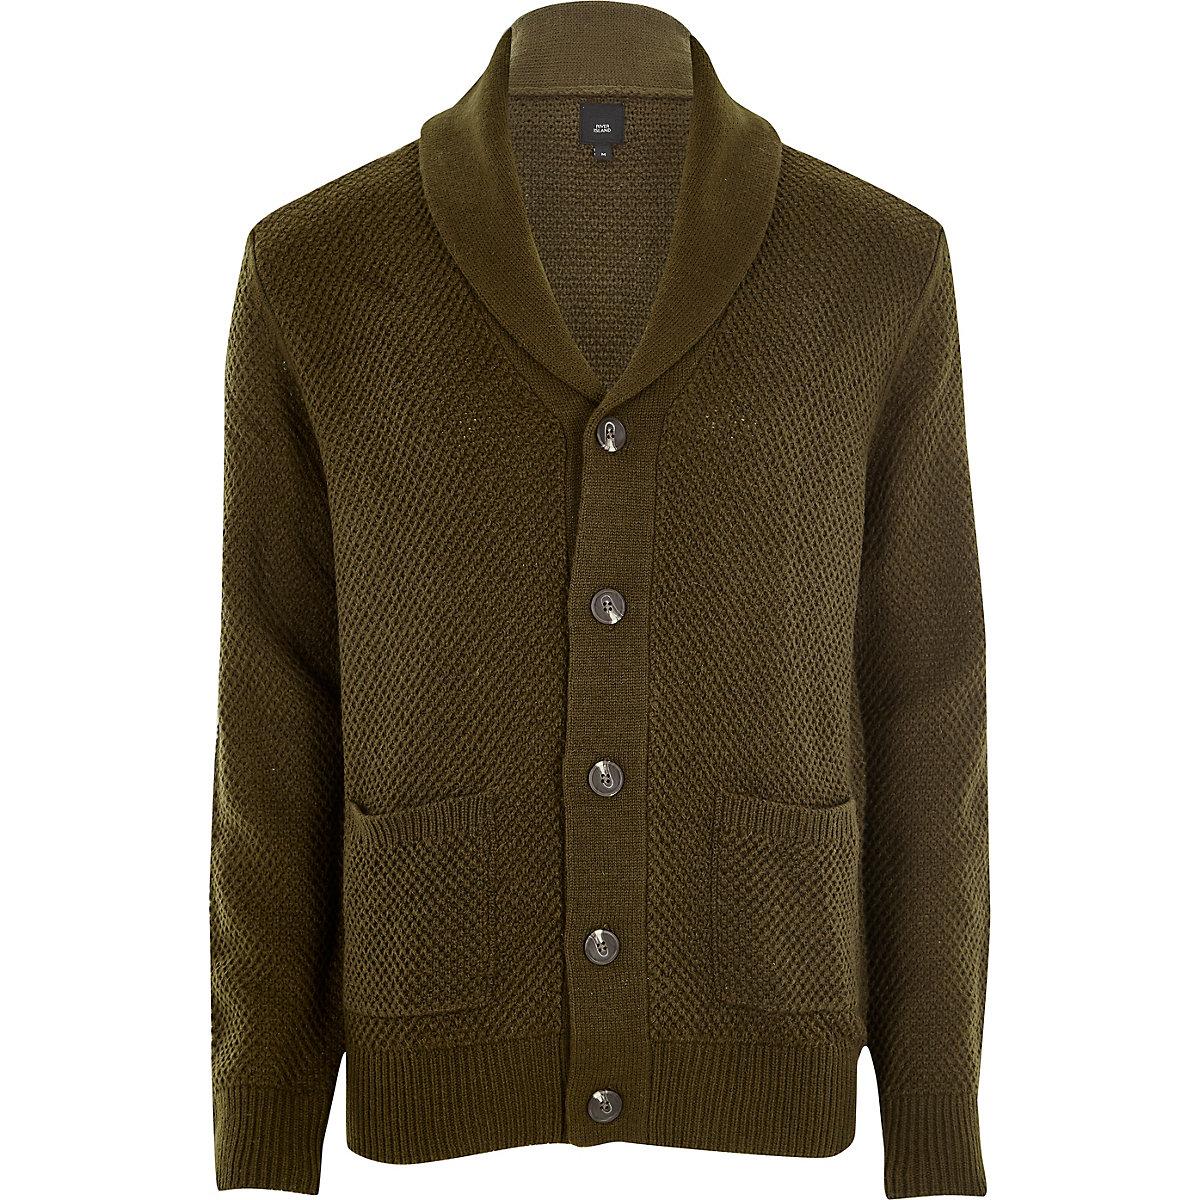 Khaki green shawl neck button-down cardigan